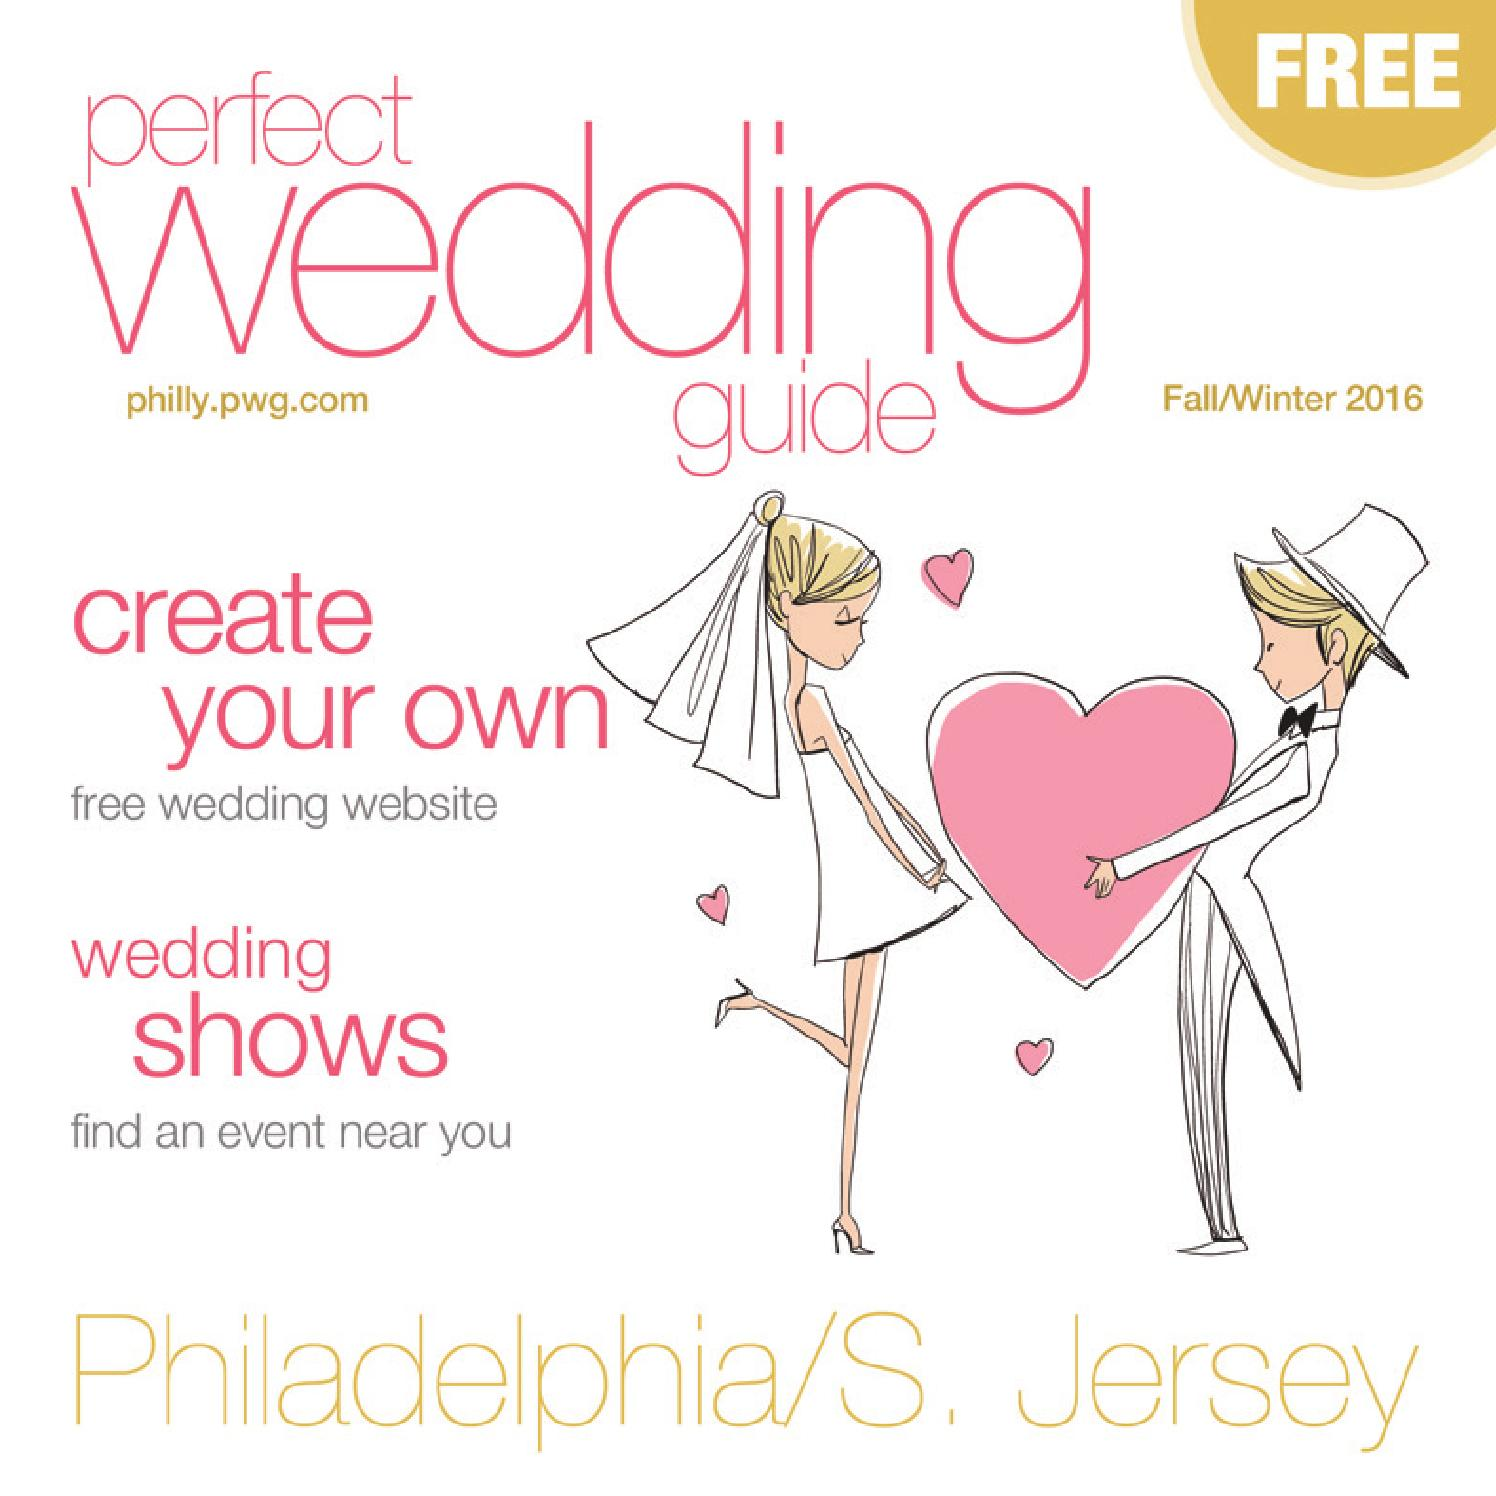 Perfect wedding guide philadelphias jersey fallwinter 2016 by perfect wedding guide philadelphias jersey fallwinter 2016 by rick caldwell issuu fandeluxe Choice Image